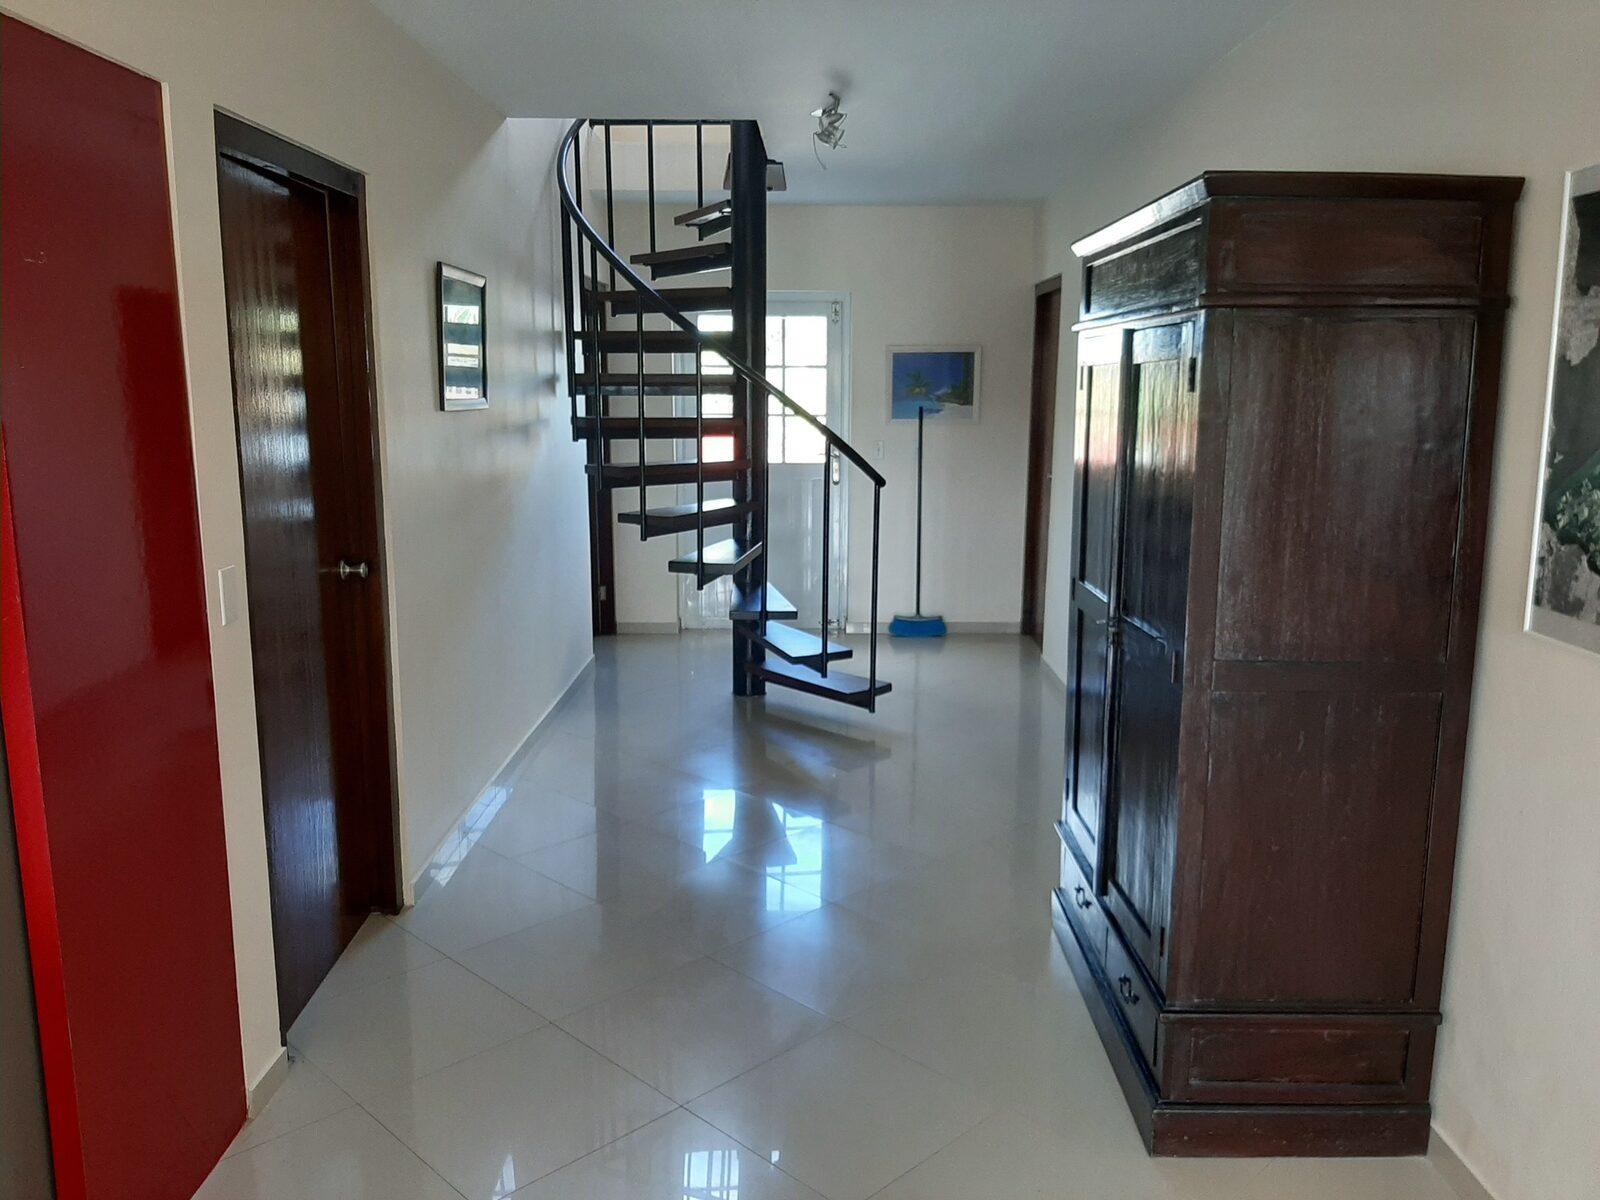 3-Bedroom Villa with Seaview